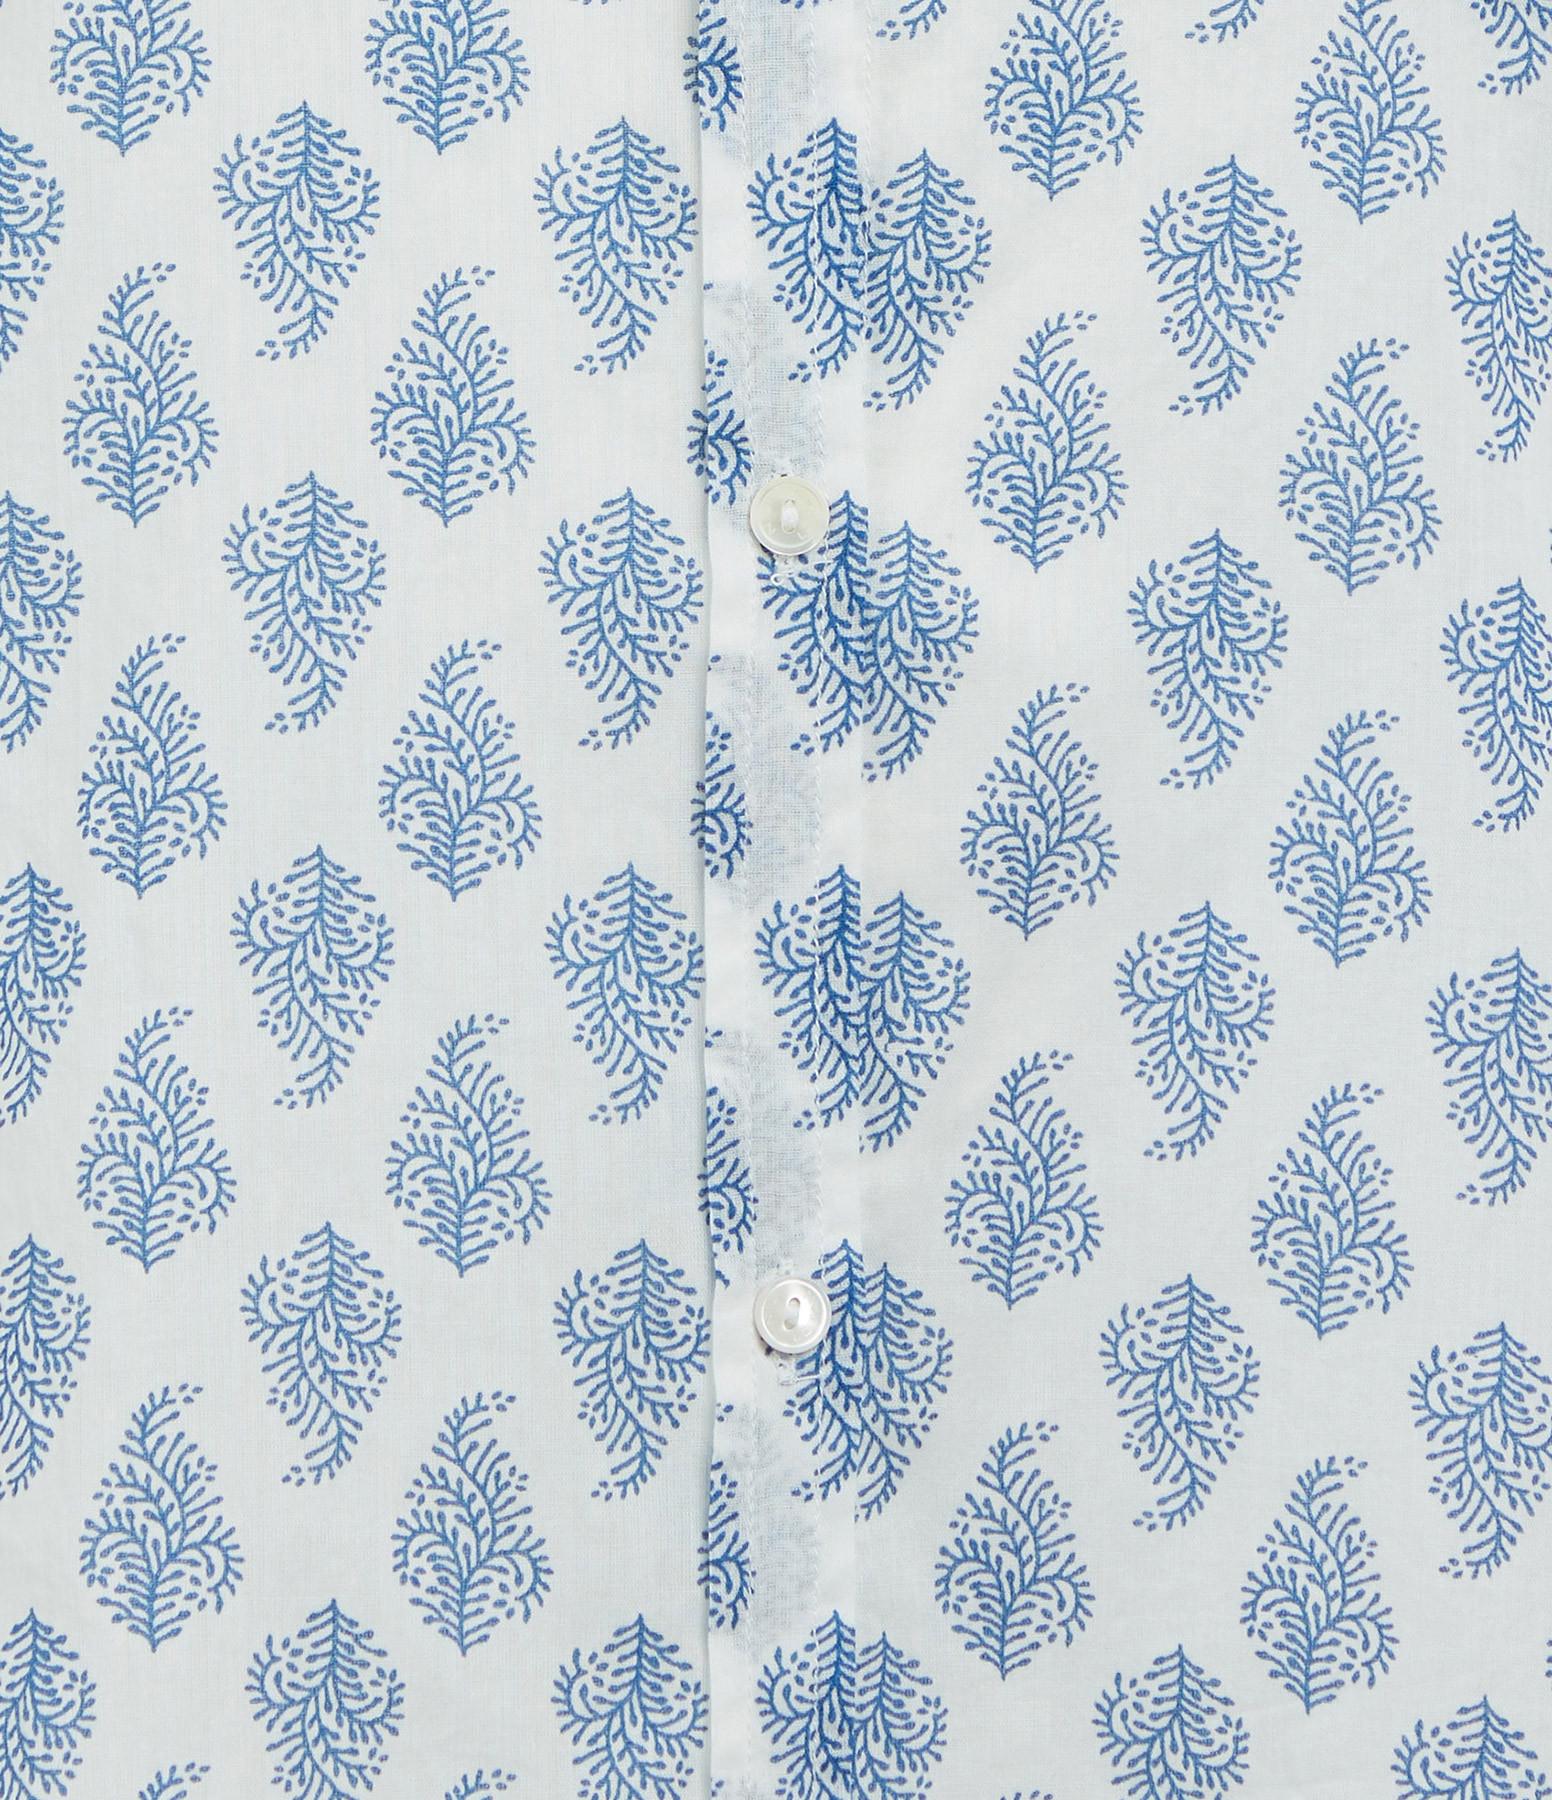 NILI LOTAN - Chemise NL Coton Imprimé Paisley